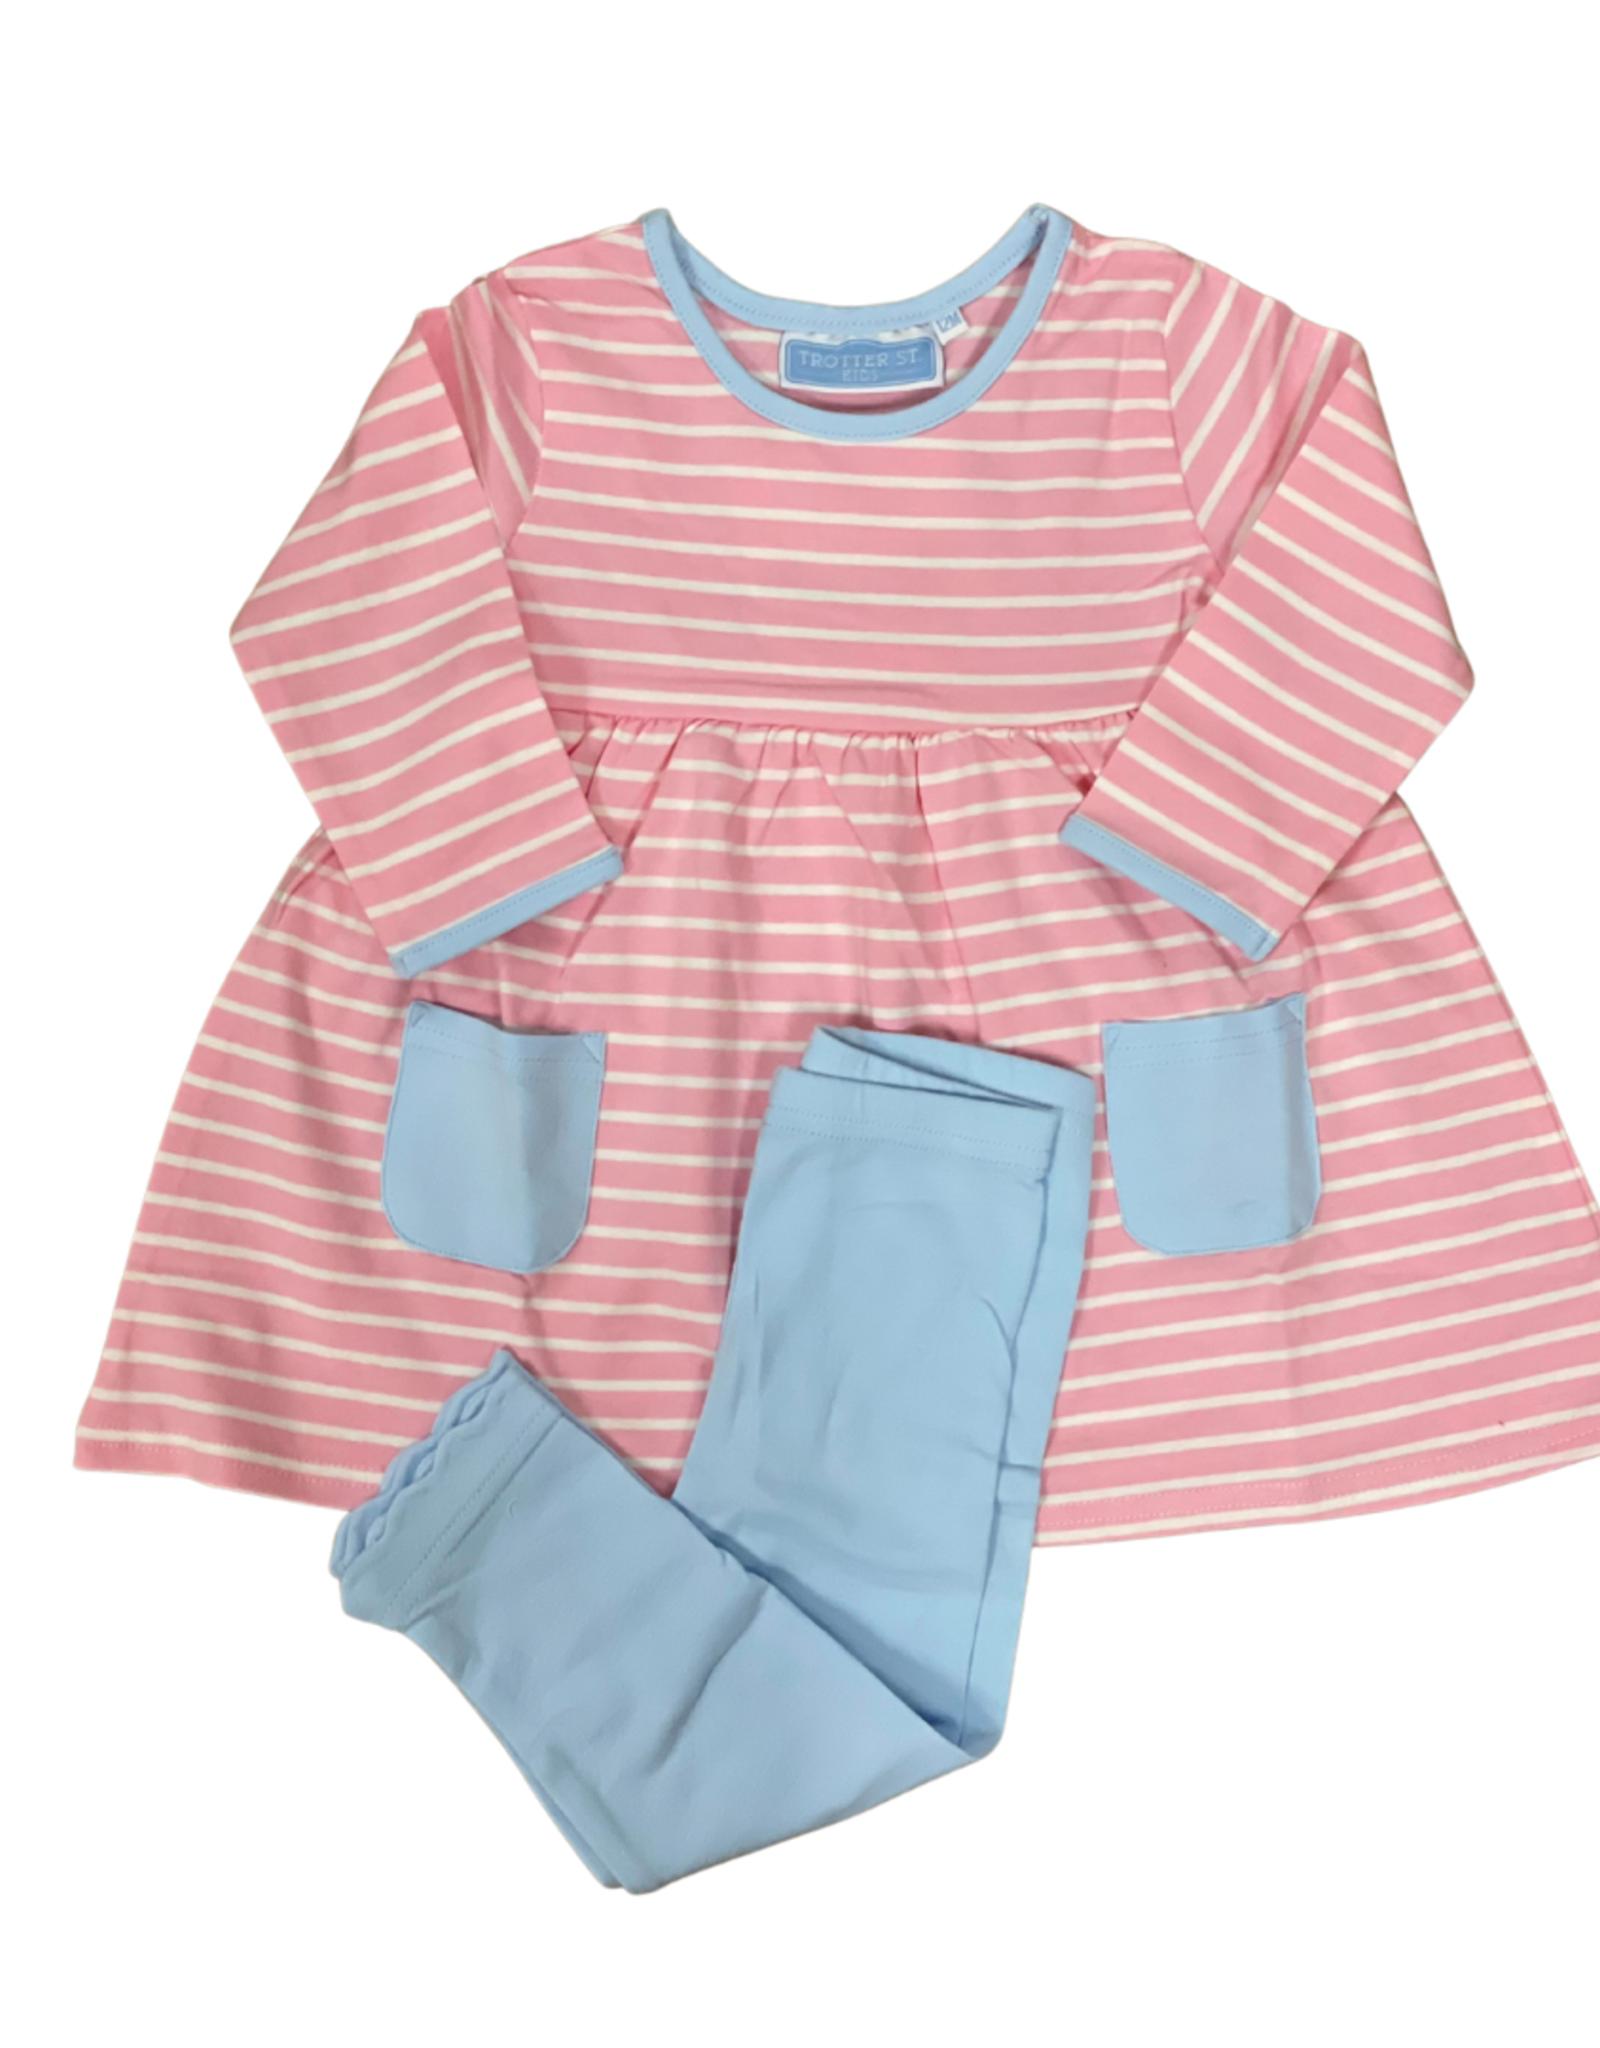 Trotter Street Kids Annie Long Sleeve Pant Set Light Pink/Blue